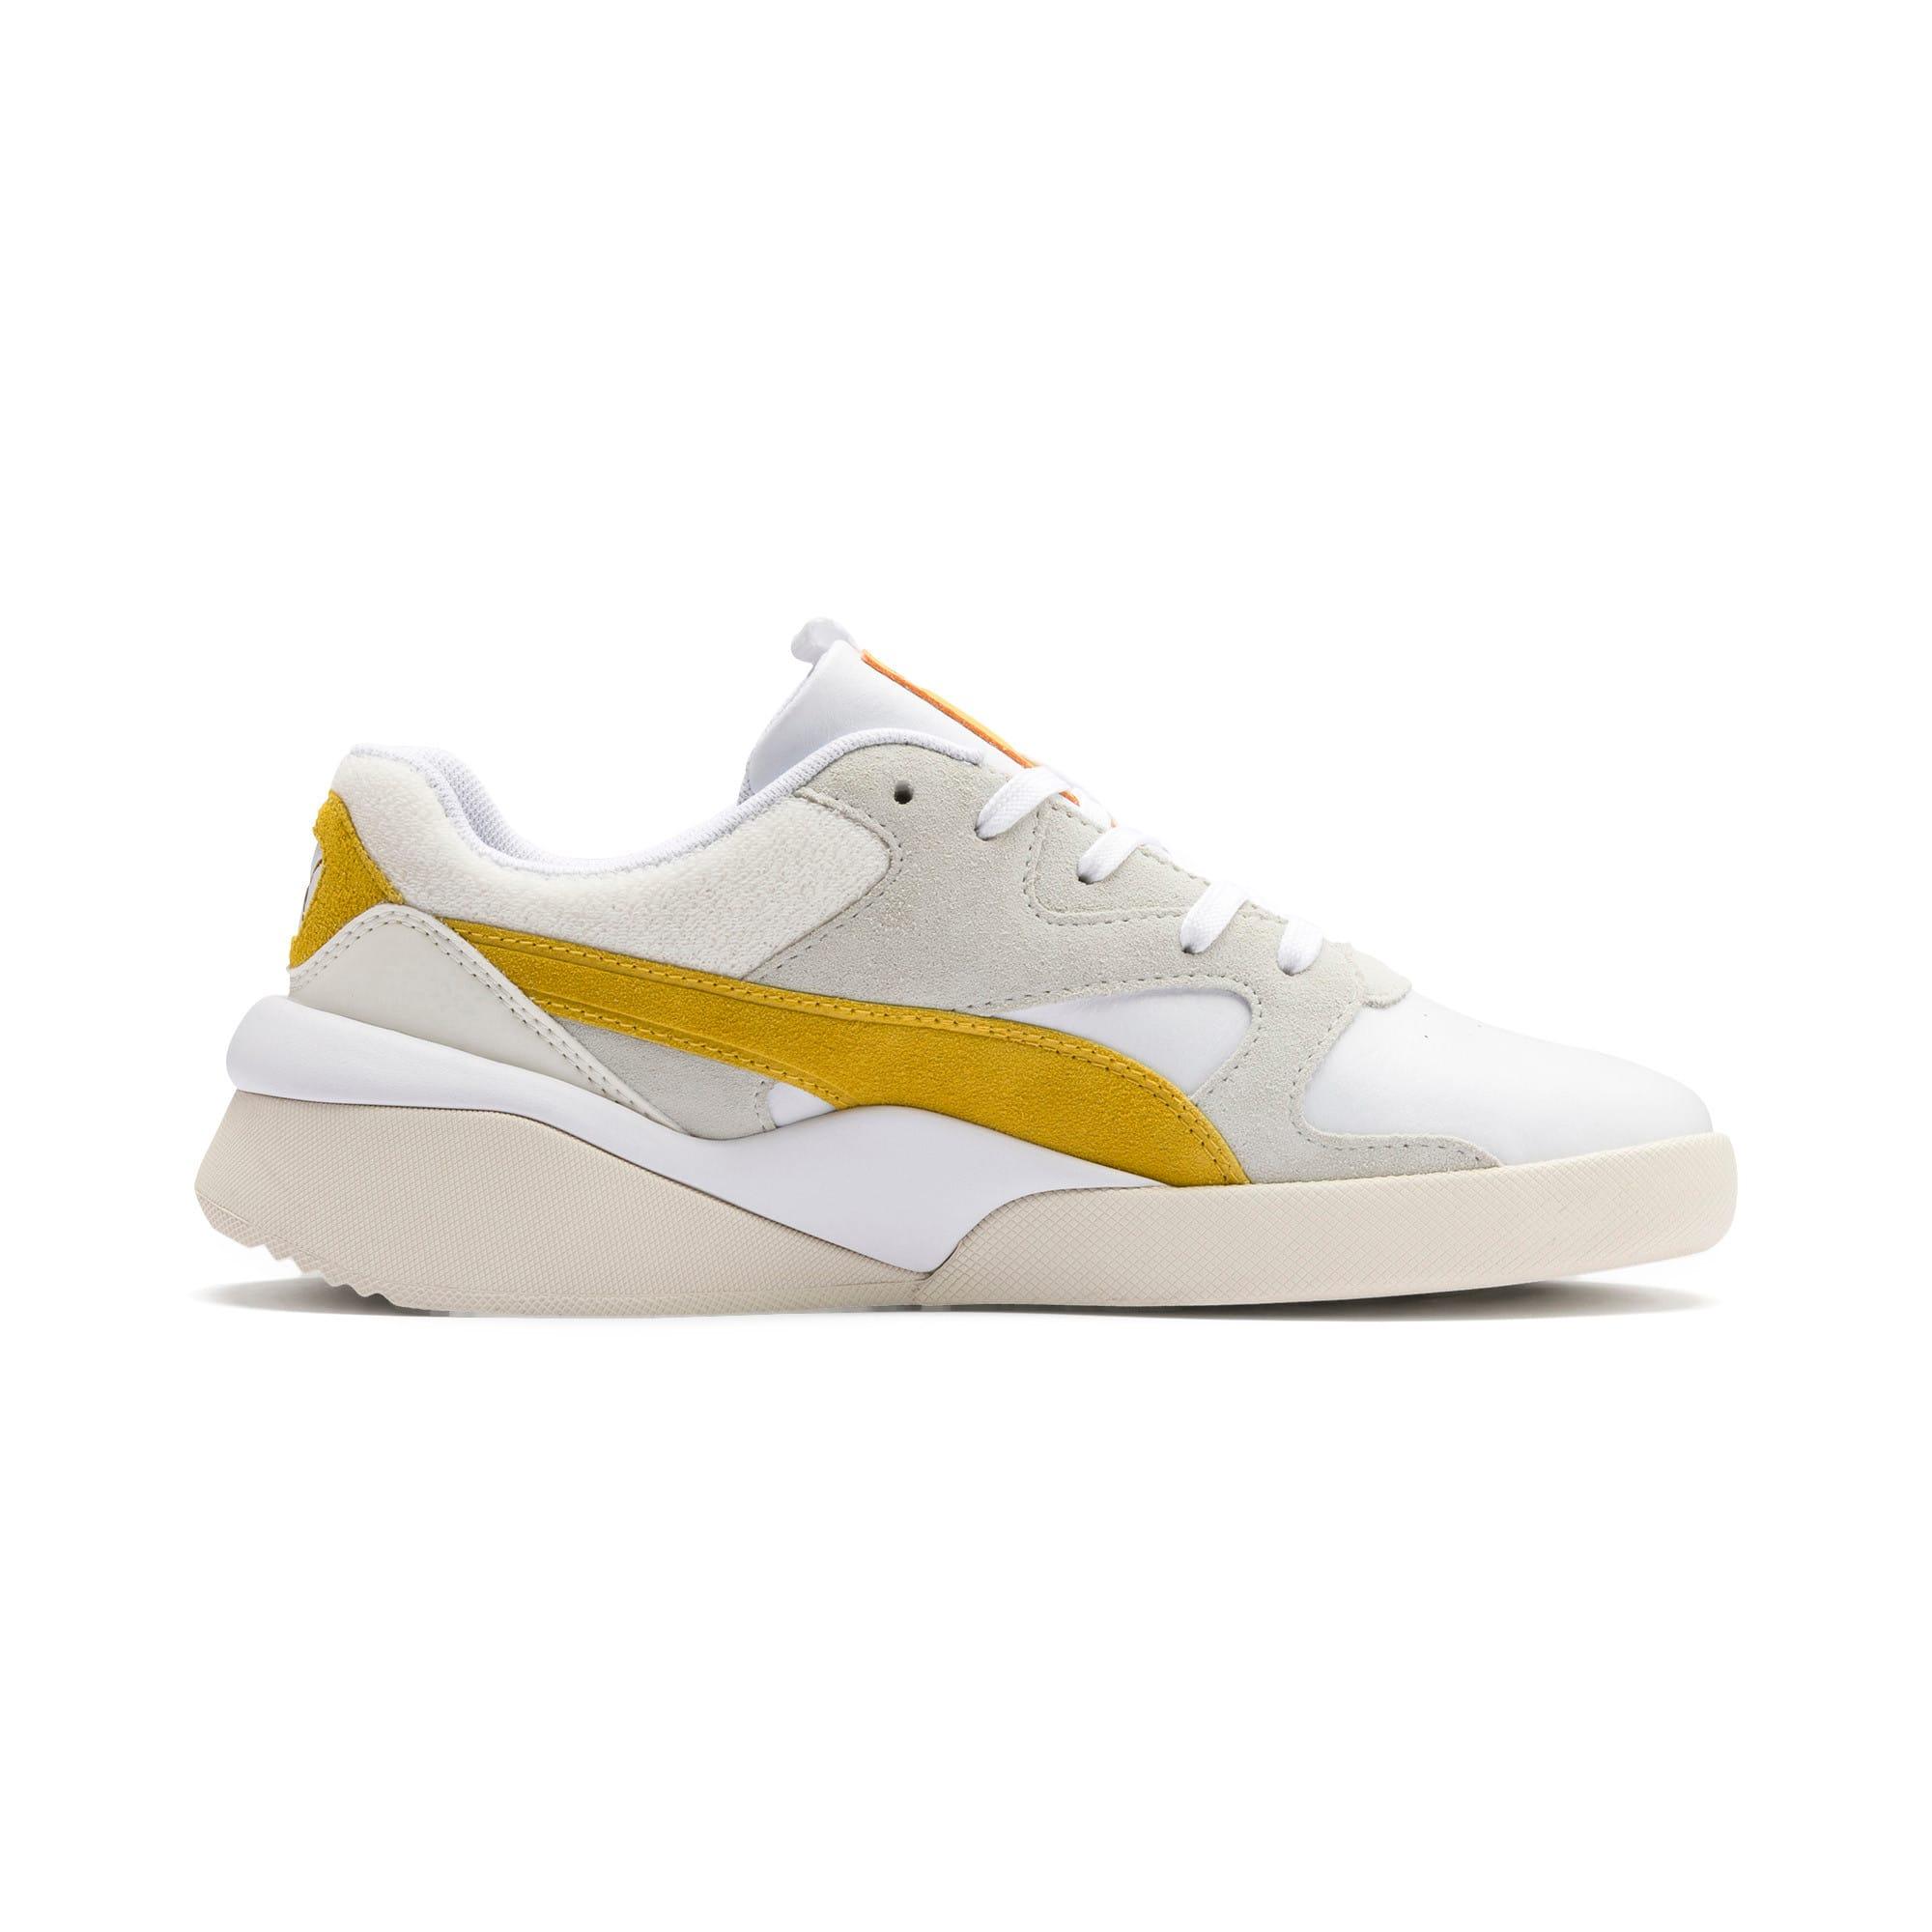 Thumbnail 6 of Aeon Heritage Women's Sneakers, Puma White-Sulphur, medium